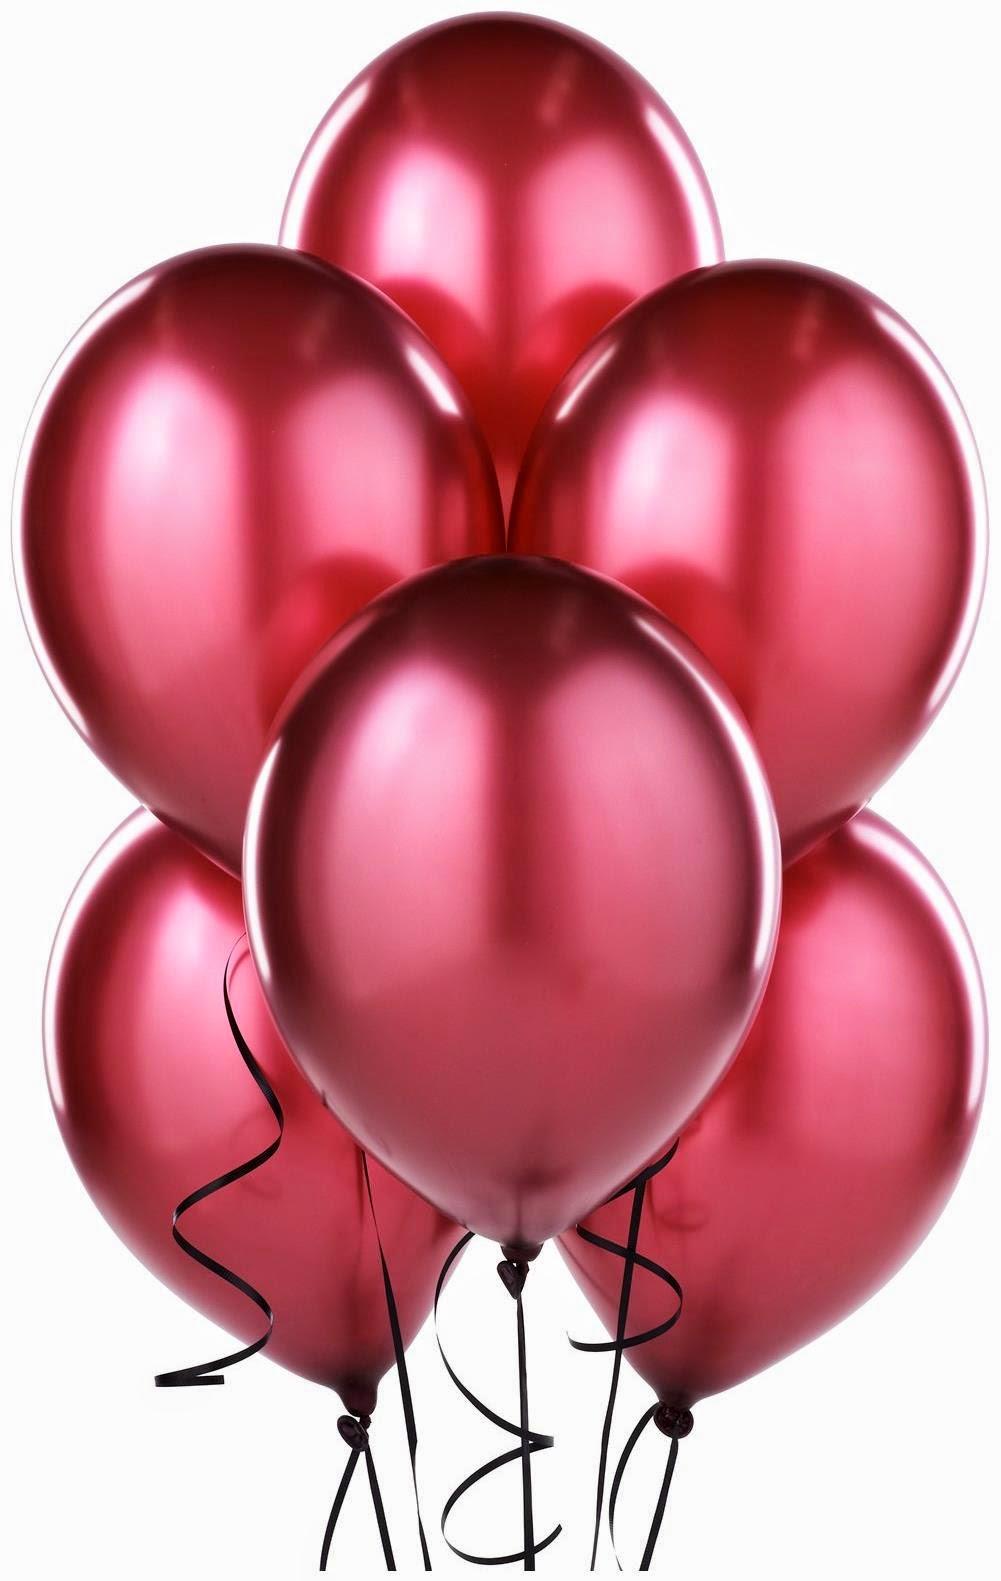 http://www.partybell.com/p-17095-plum-balloons.aspx